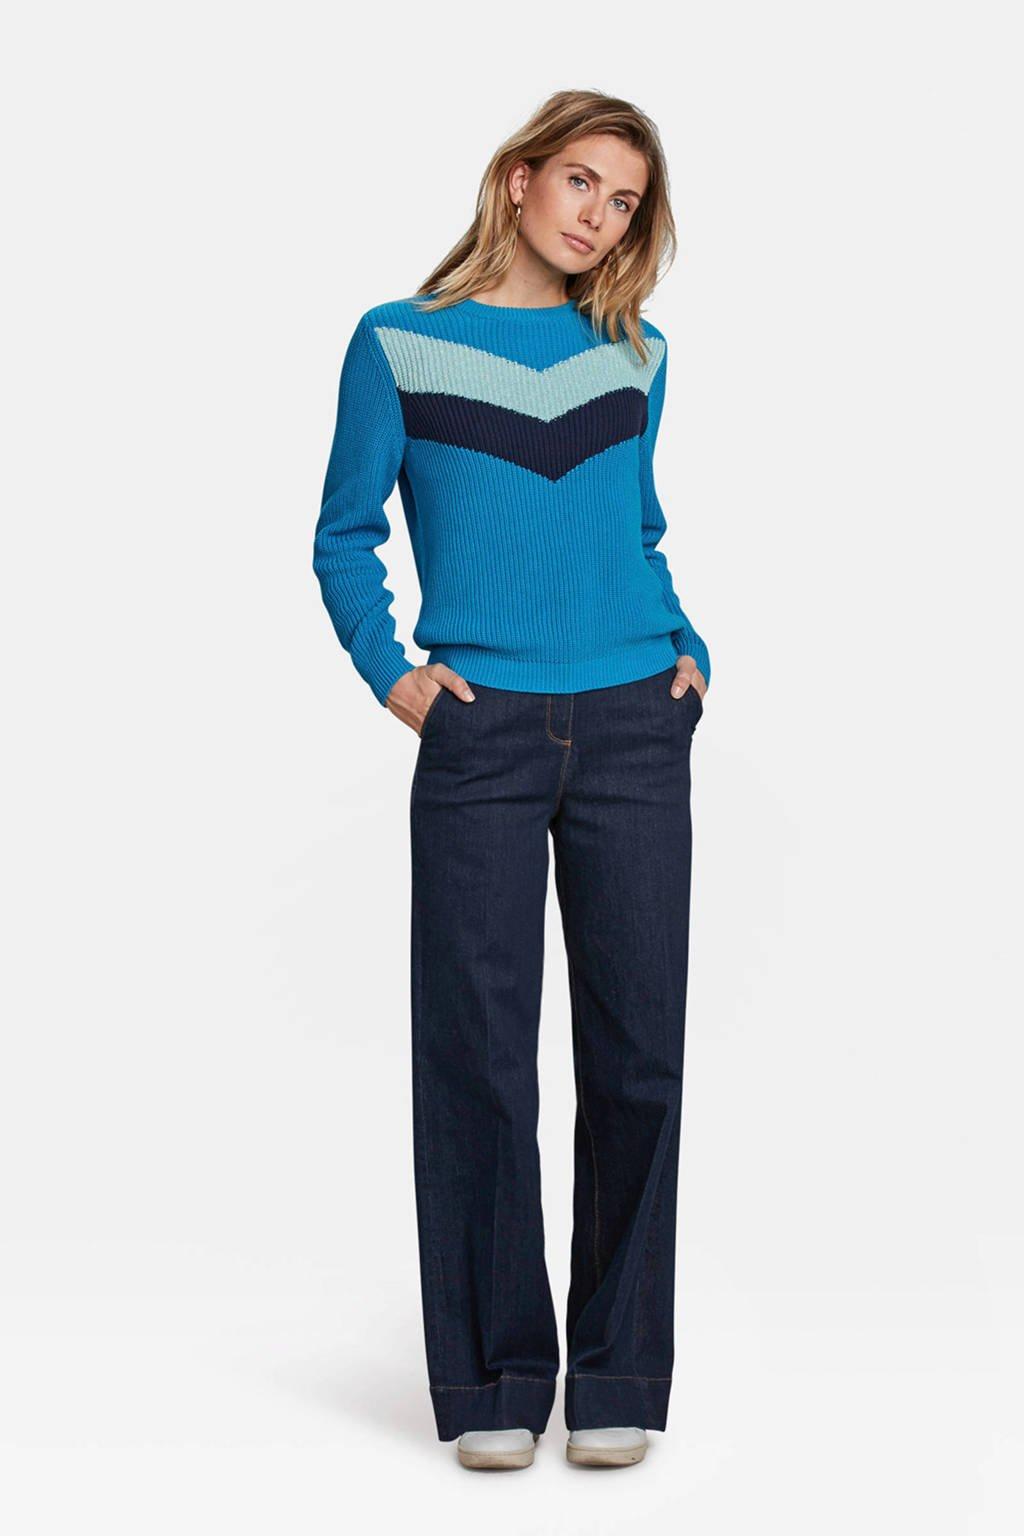 WE Fashion gebreide trui met colorblock dessin blauw, multi kleur blauw